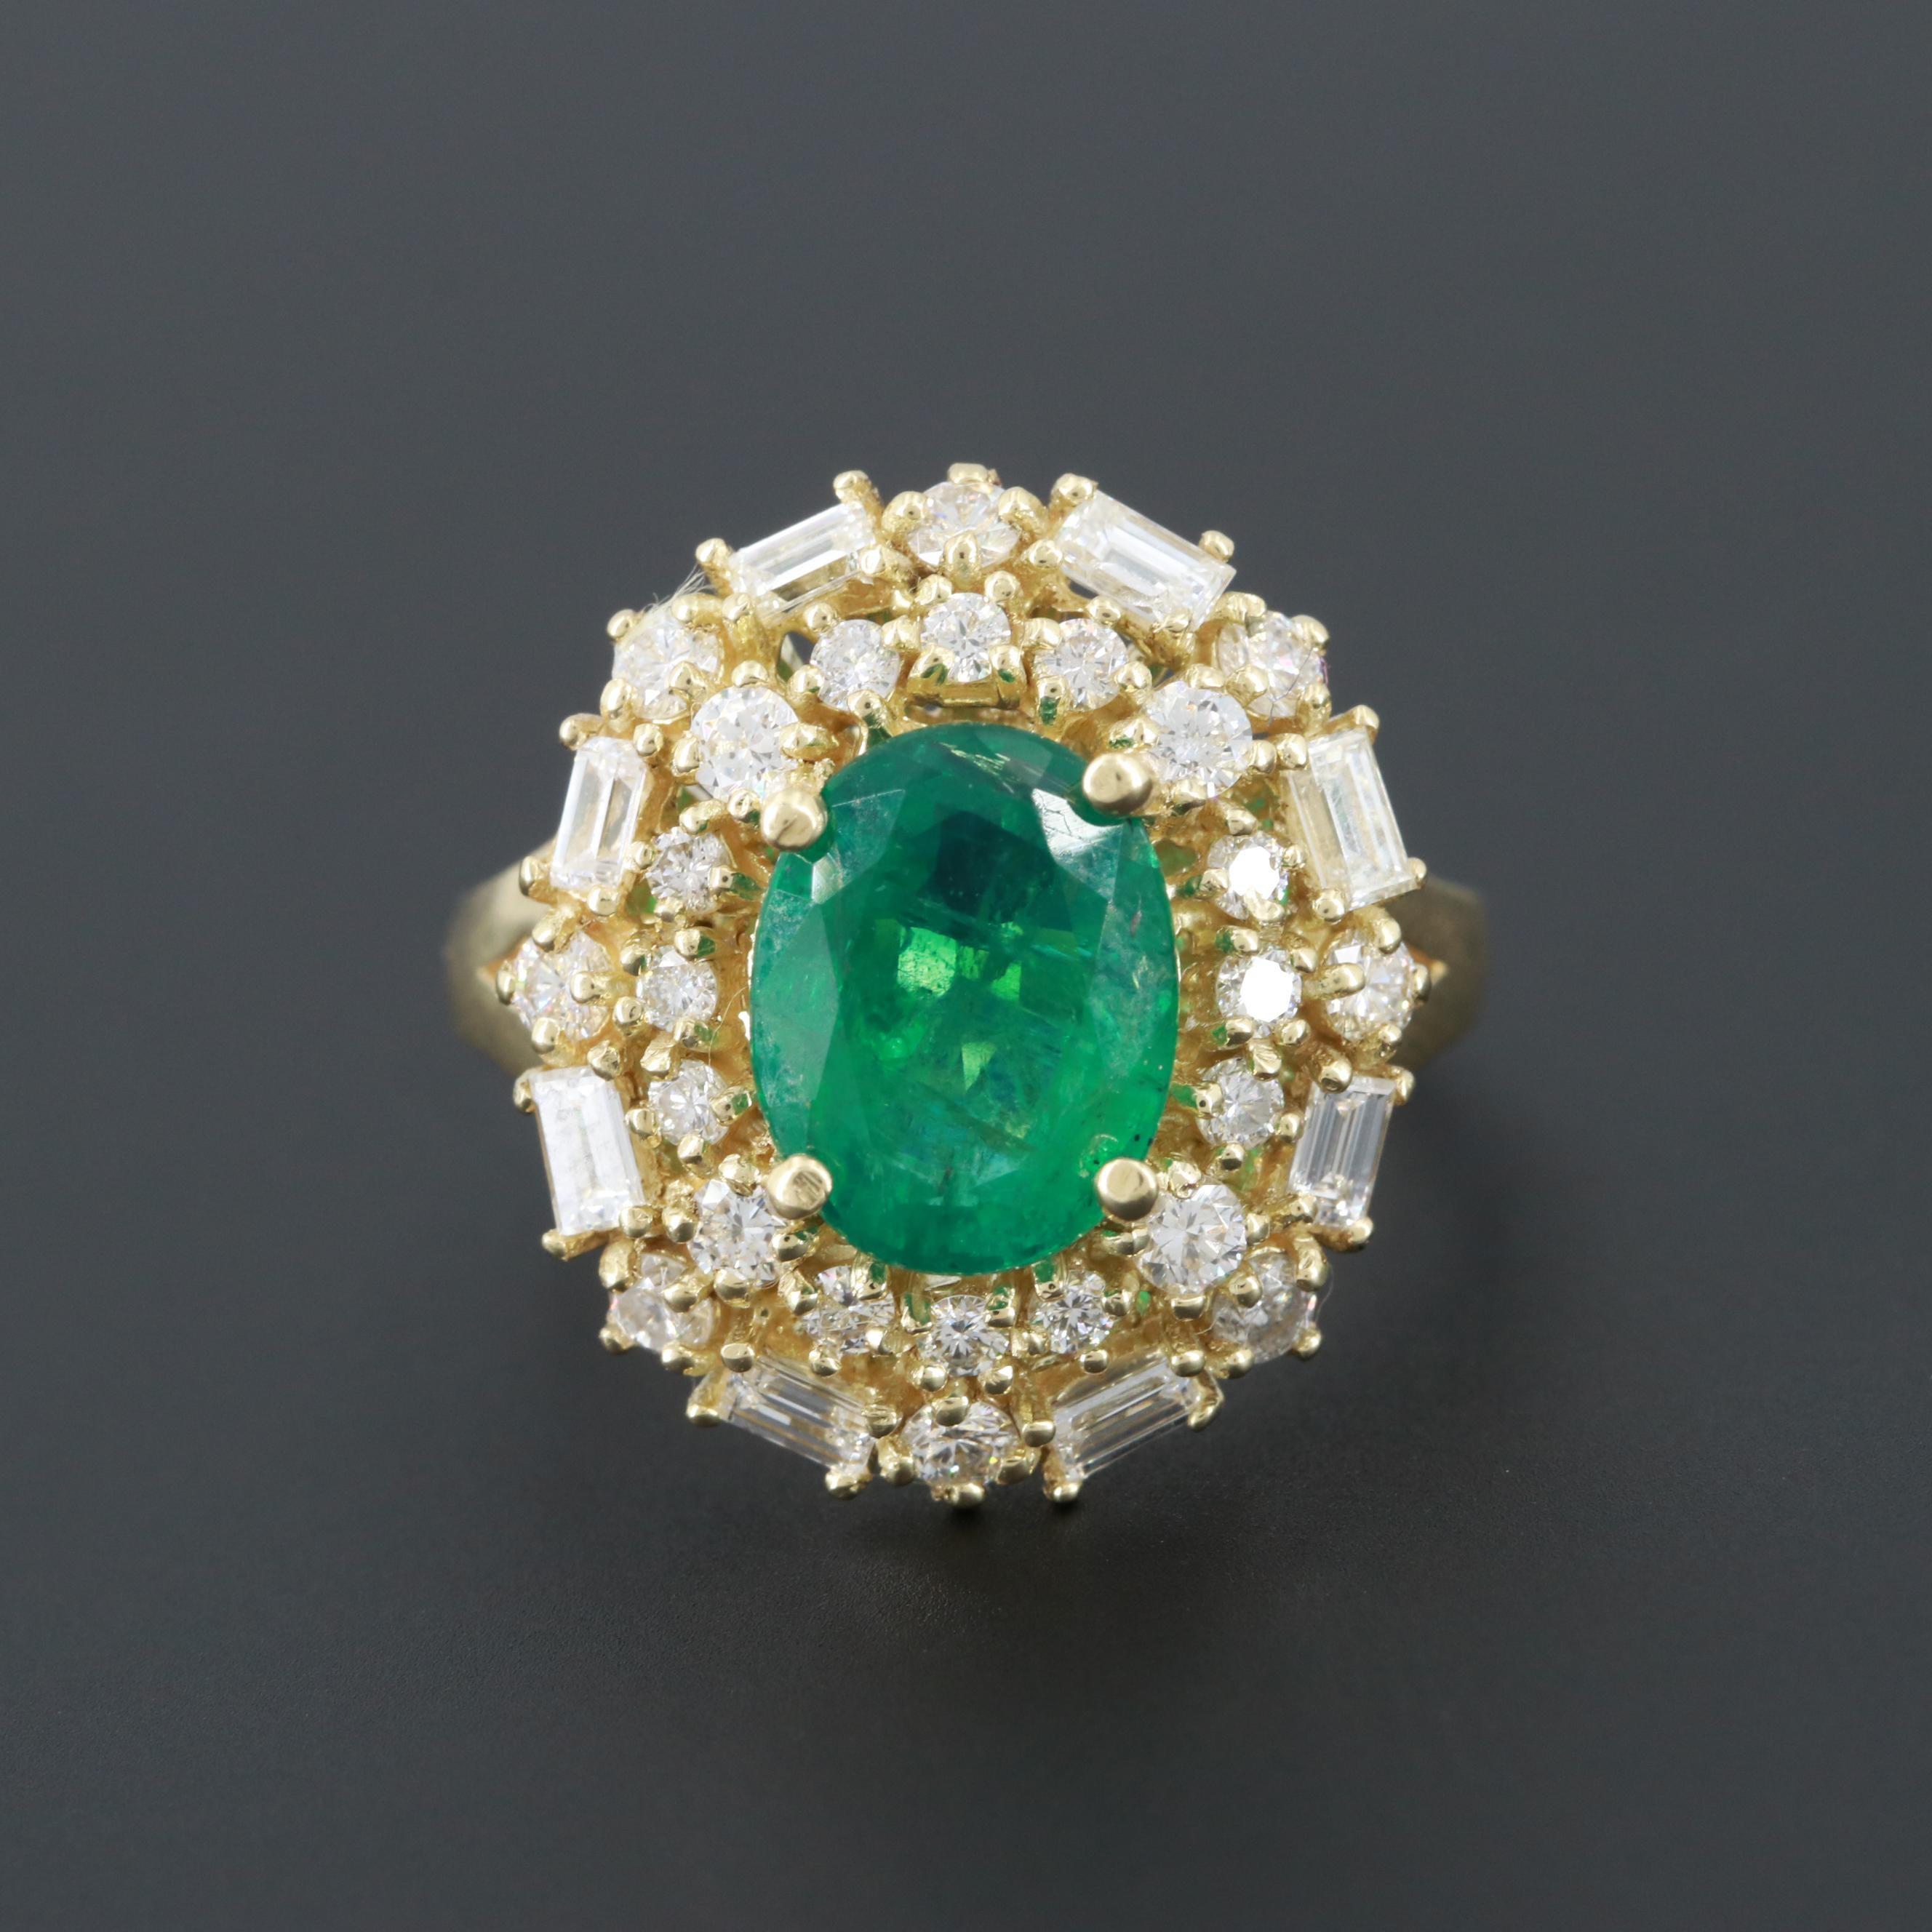 18K Yellow Gold 1.80 CT Emerald and 1.34 CTW Diamond Ring